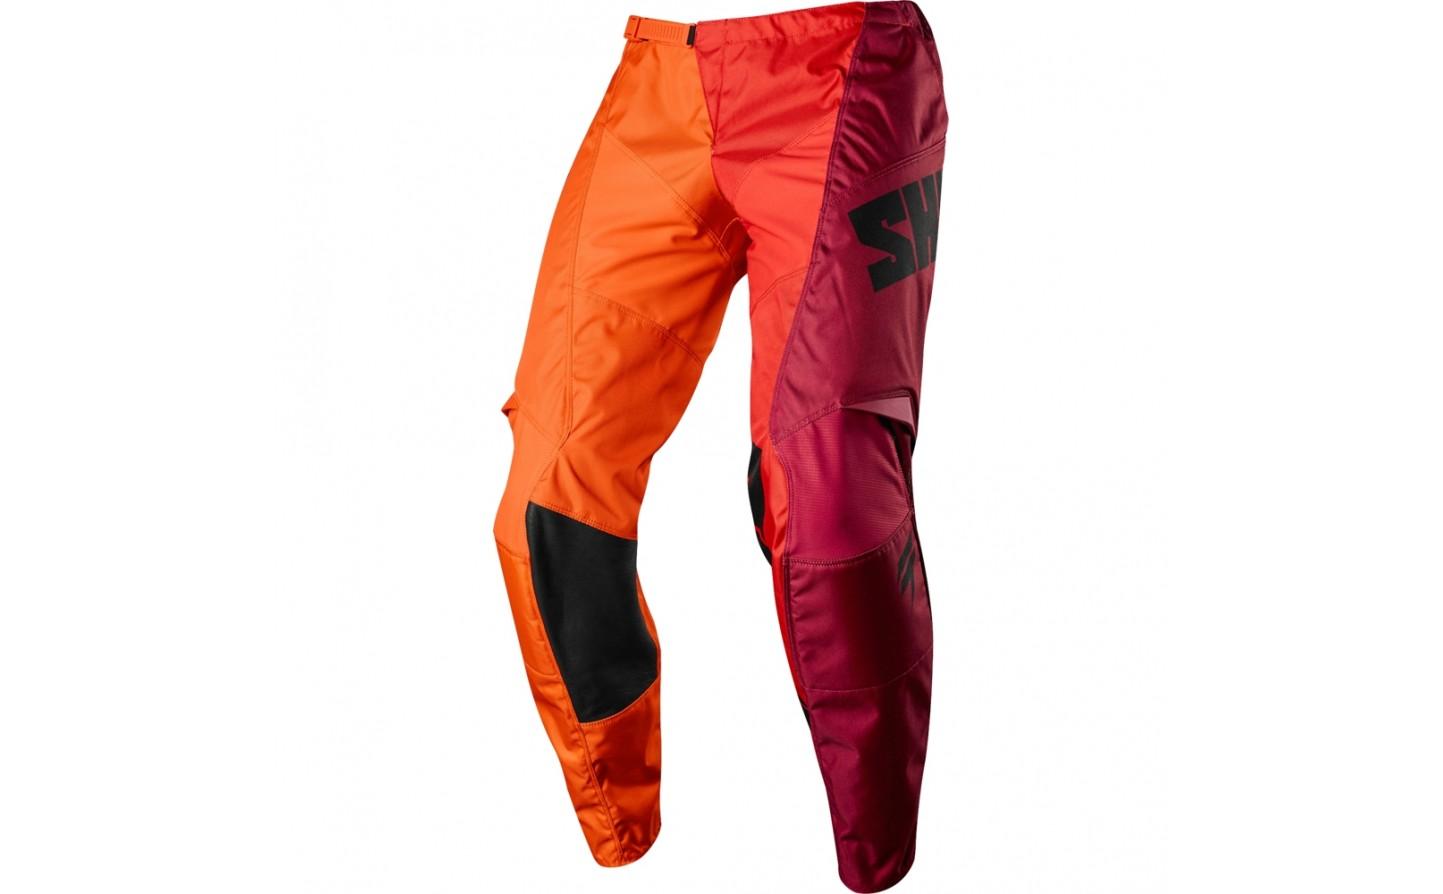 pantalon shift label whit3 tarmac naranja talle 34